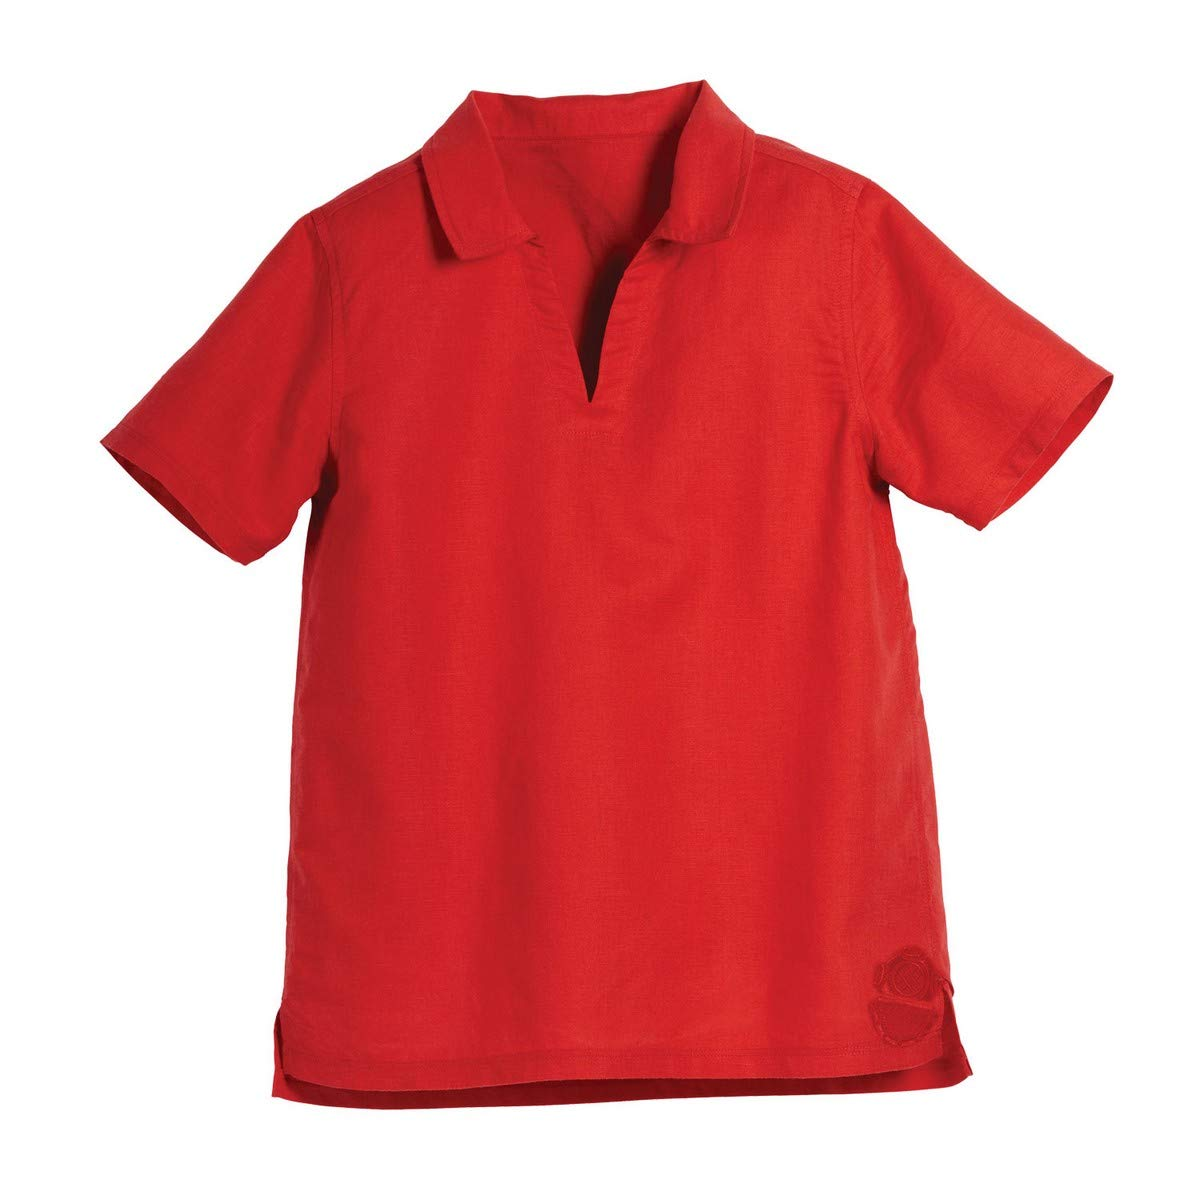 Beachcombers Kids Red Linen Cotton V-Neck Collar Short Sleeve Polo Shirt Apparel Large